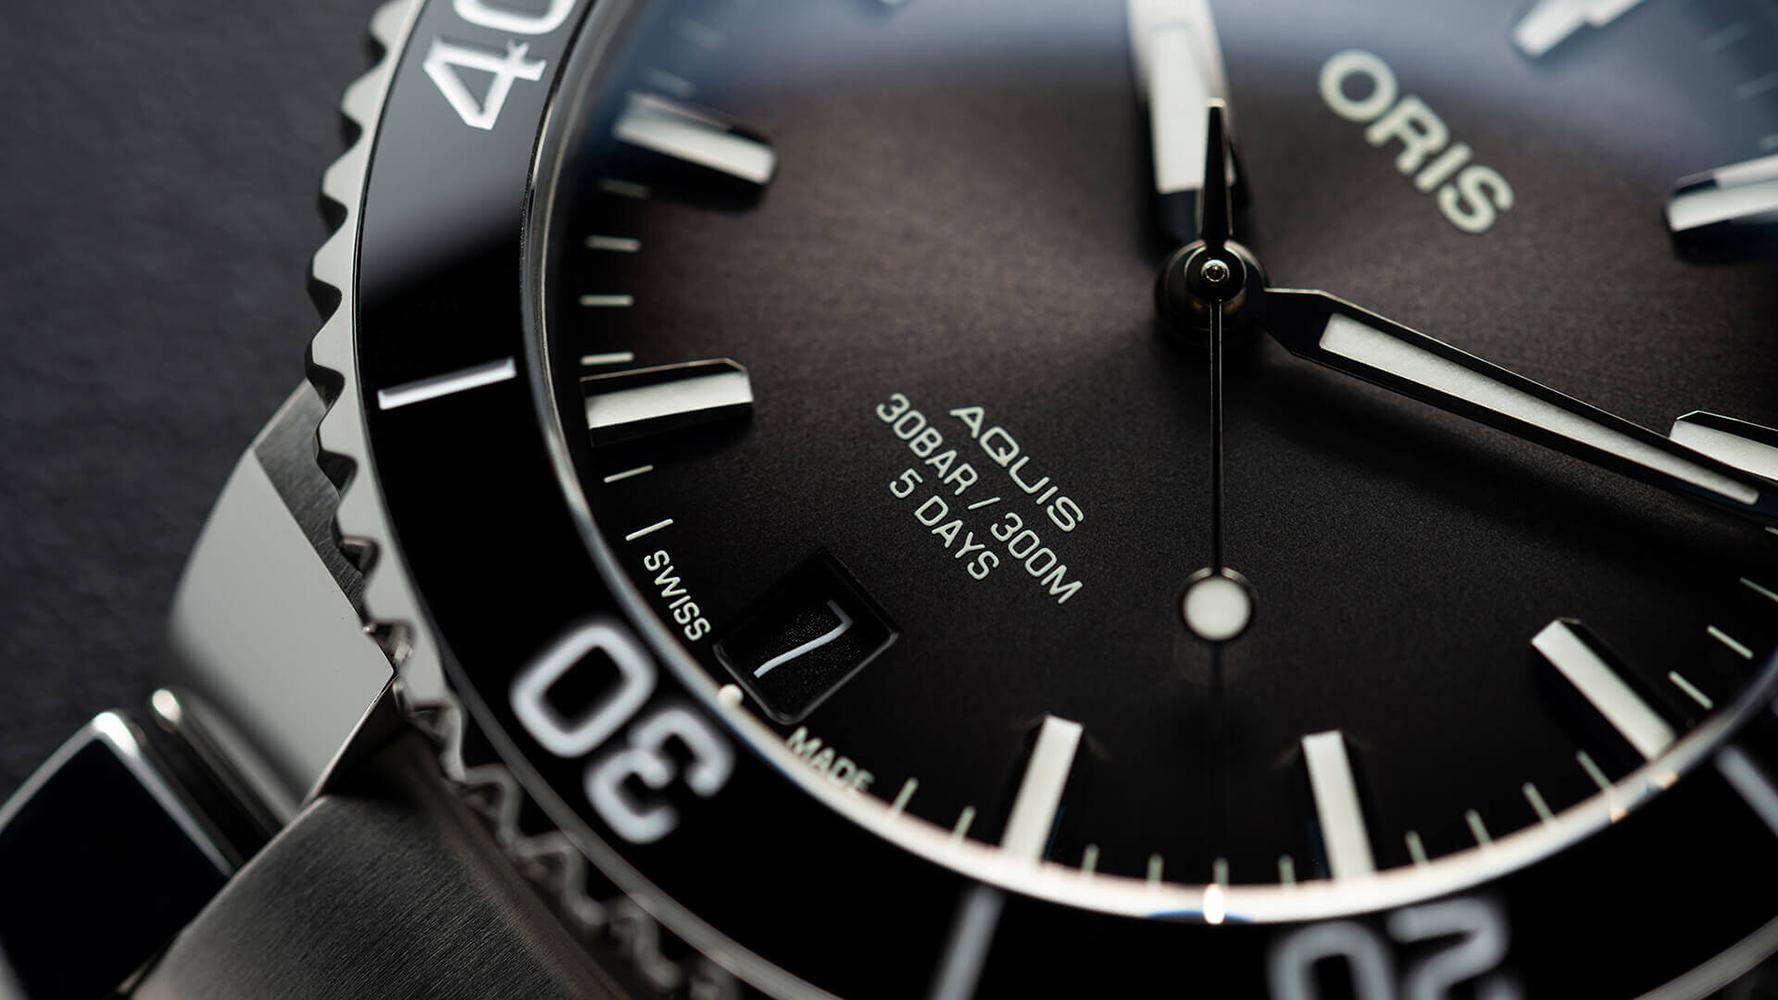 01 400 7769 4154-07 4 22 74FC zegarek męski Aquis